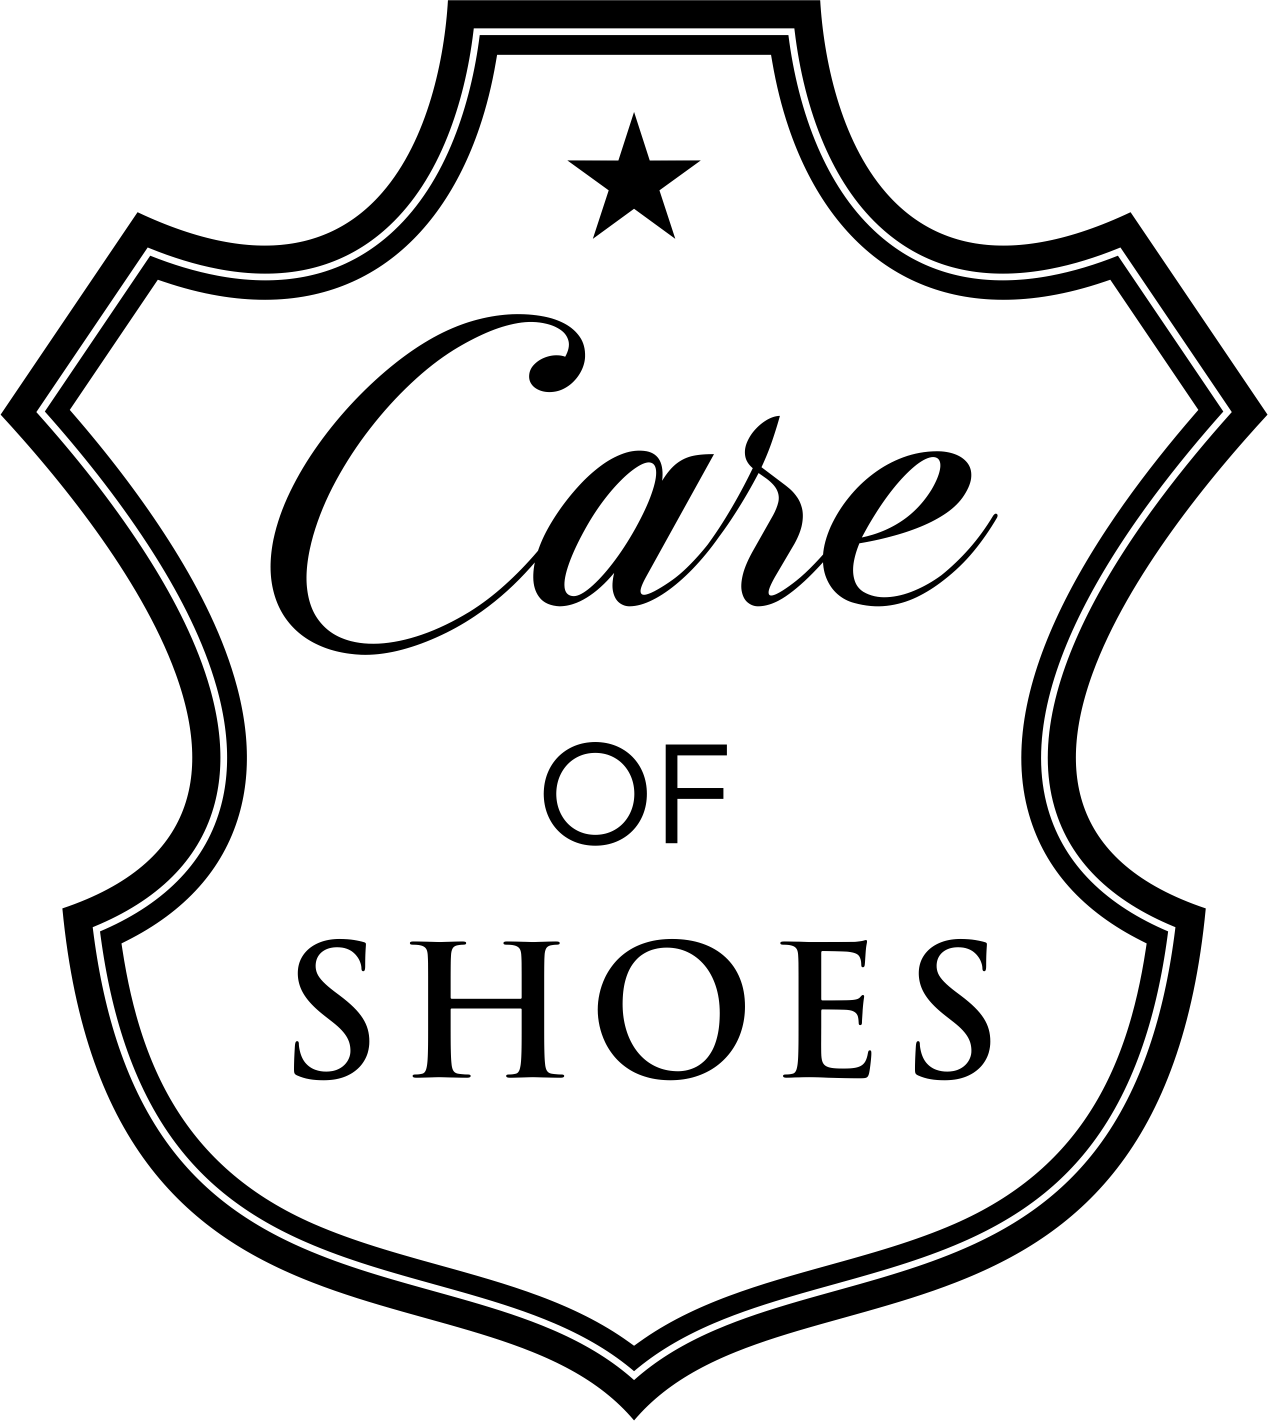 Skovård — Care of Shoes